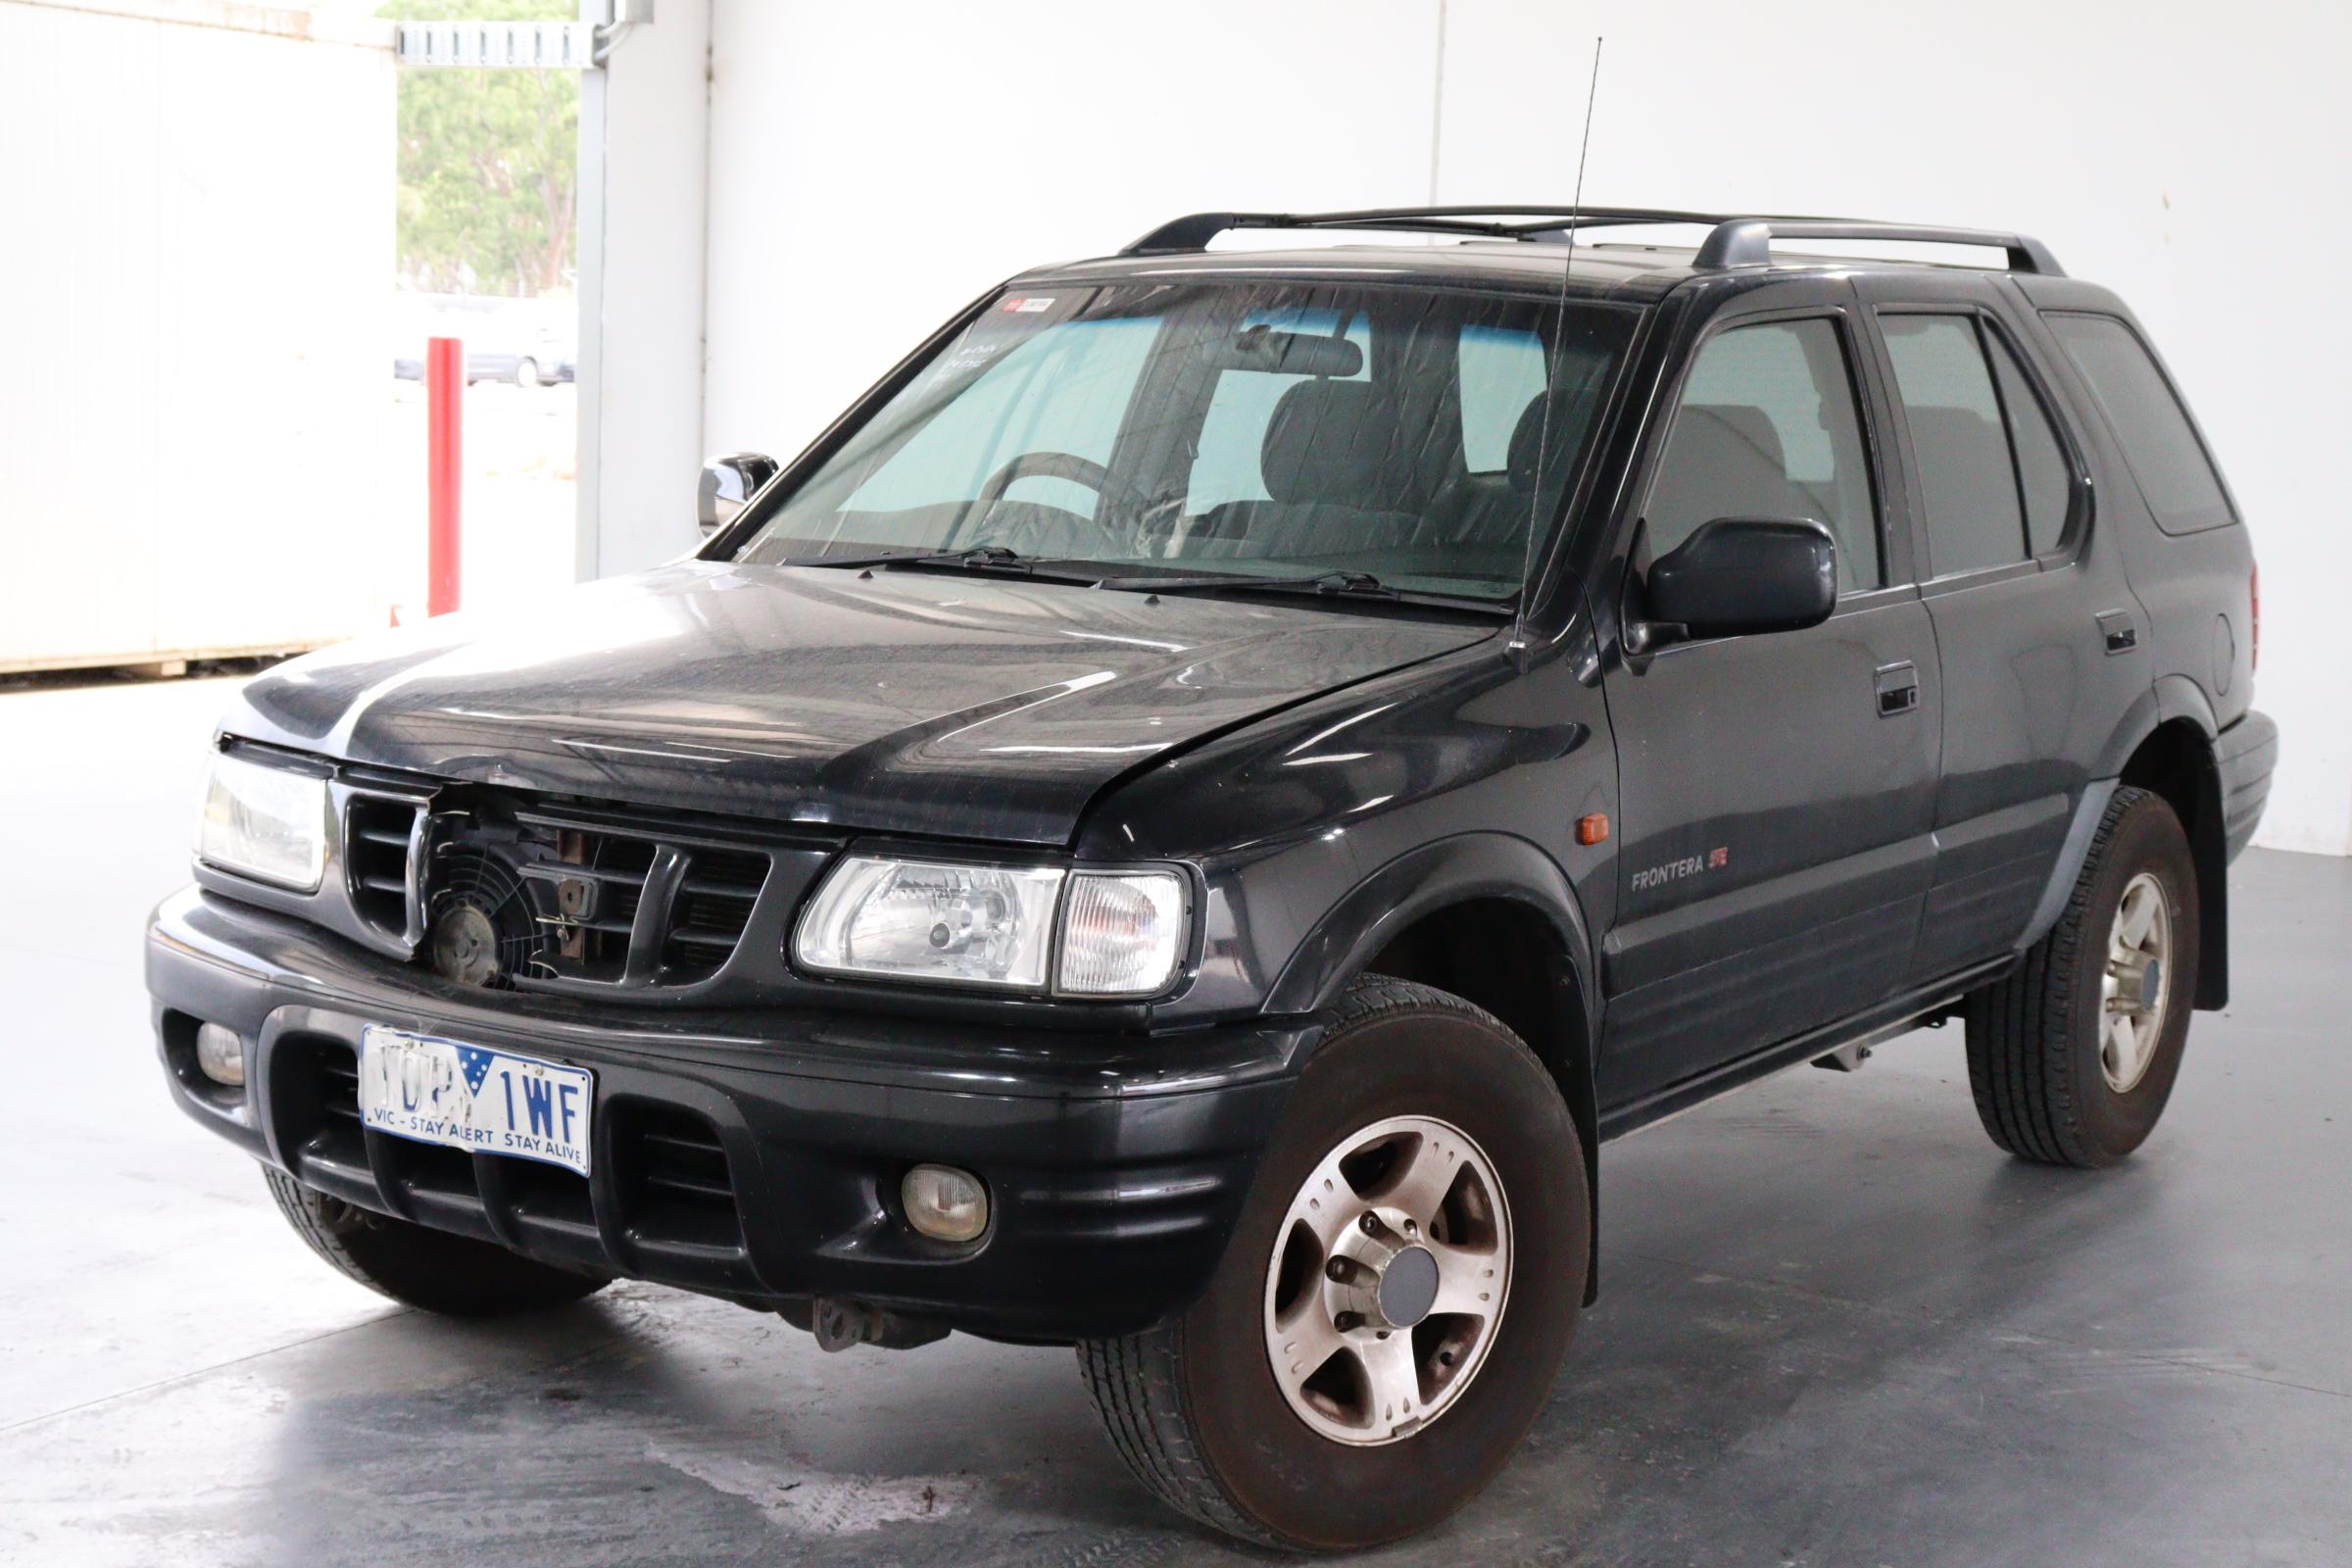 2001 Holden Frontera SE (4x4) Automatic Wagon